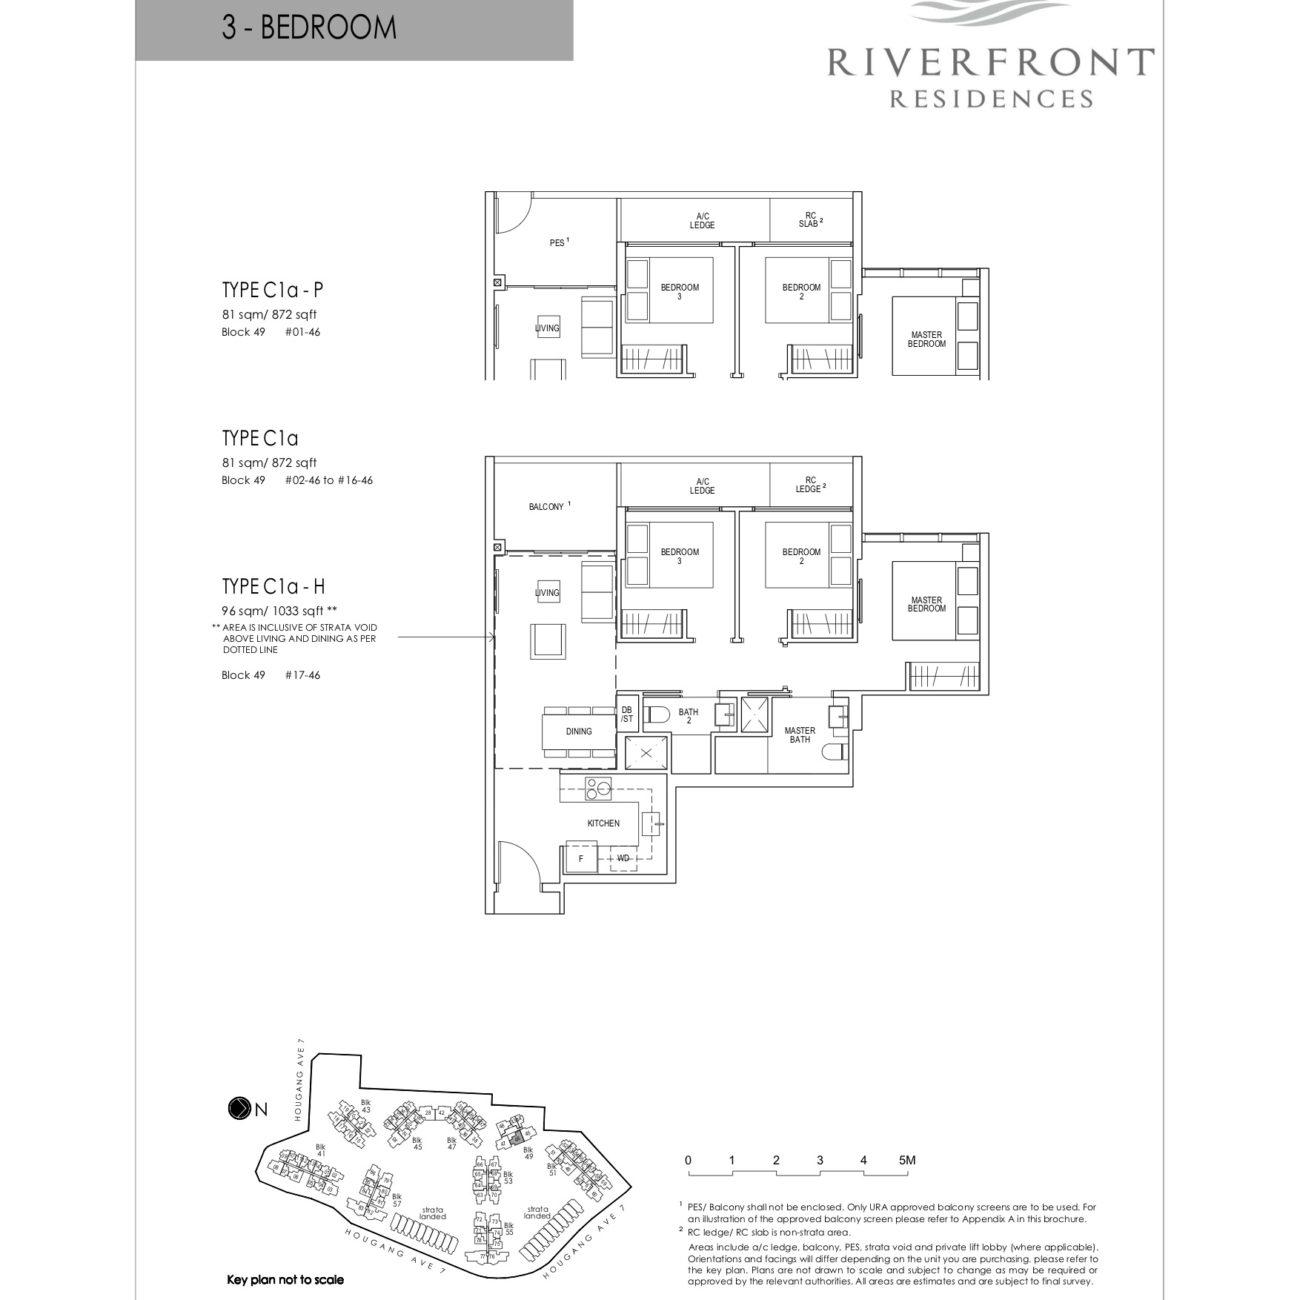 riverfront-residences-floorplan-3bedroom-c1a